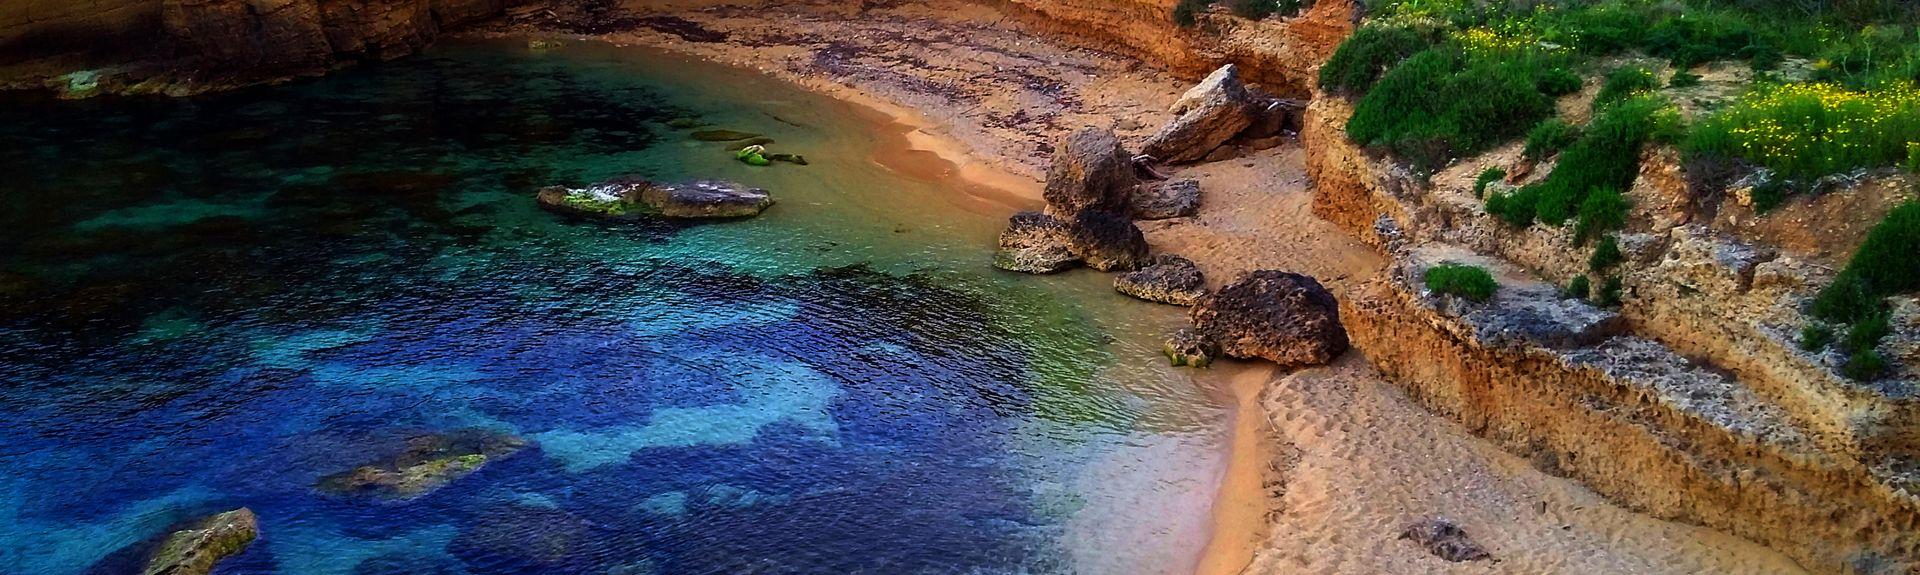 Isola, Siracusa, Sicilien, Italien